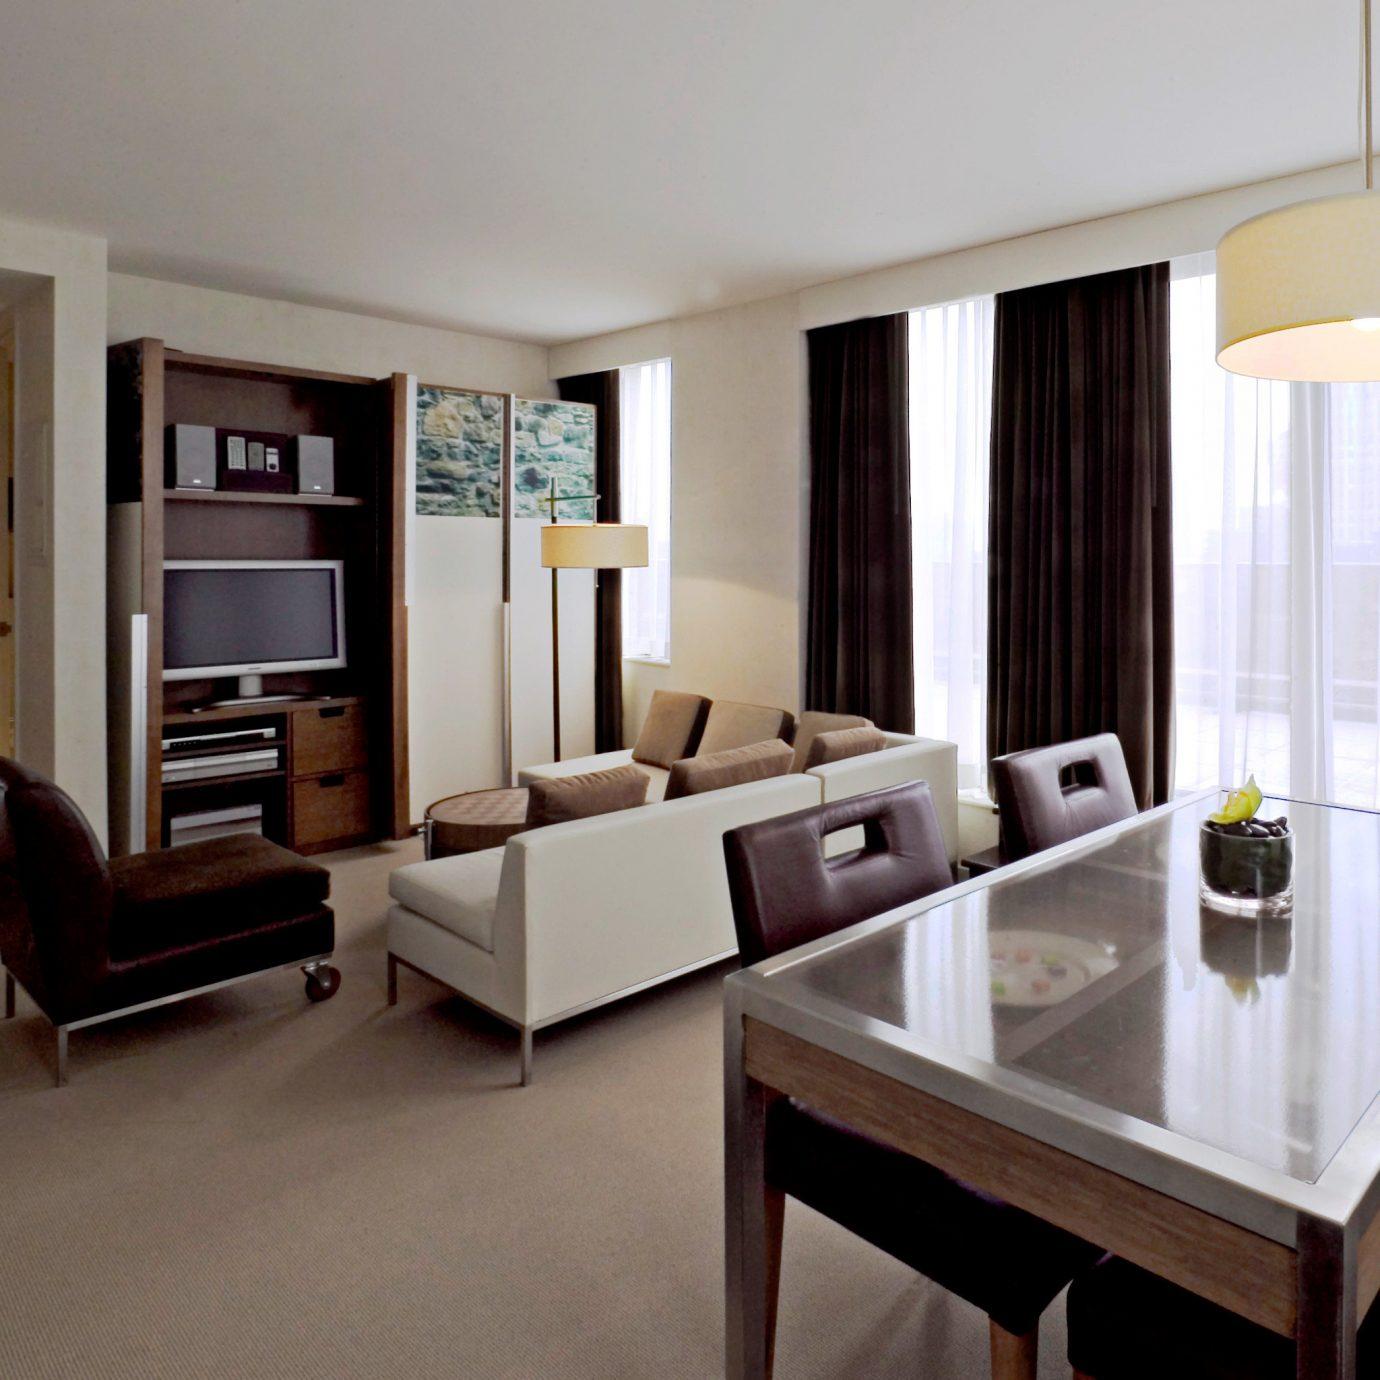 City Lounge Modern Suite property condominium living room home cottage Villa